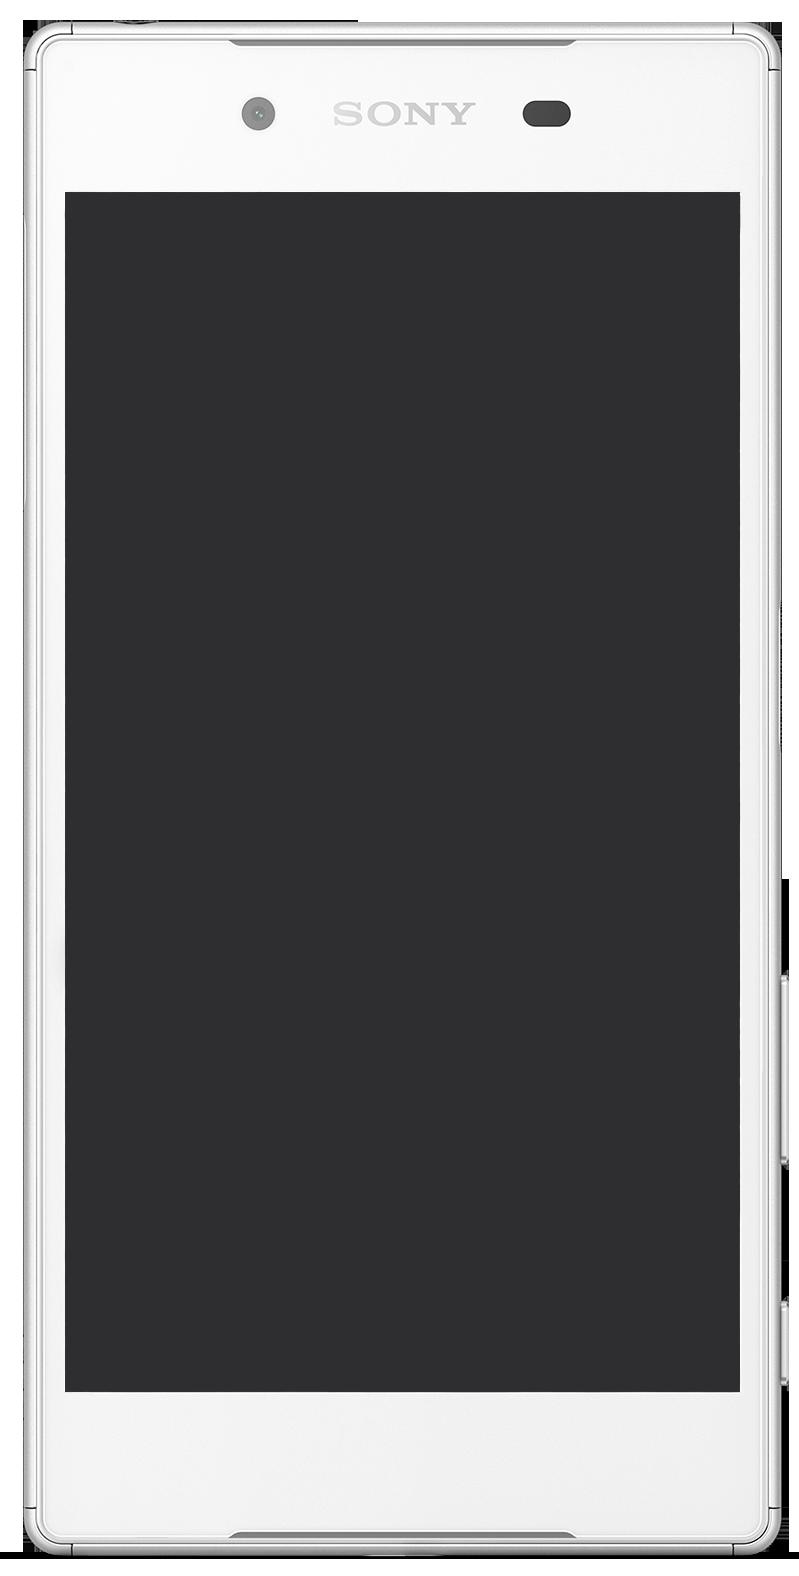 huge discount 9506b 64e66 Sony Xperia Z5 - Wikipedia